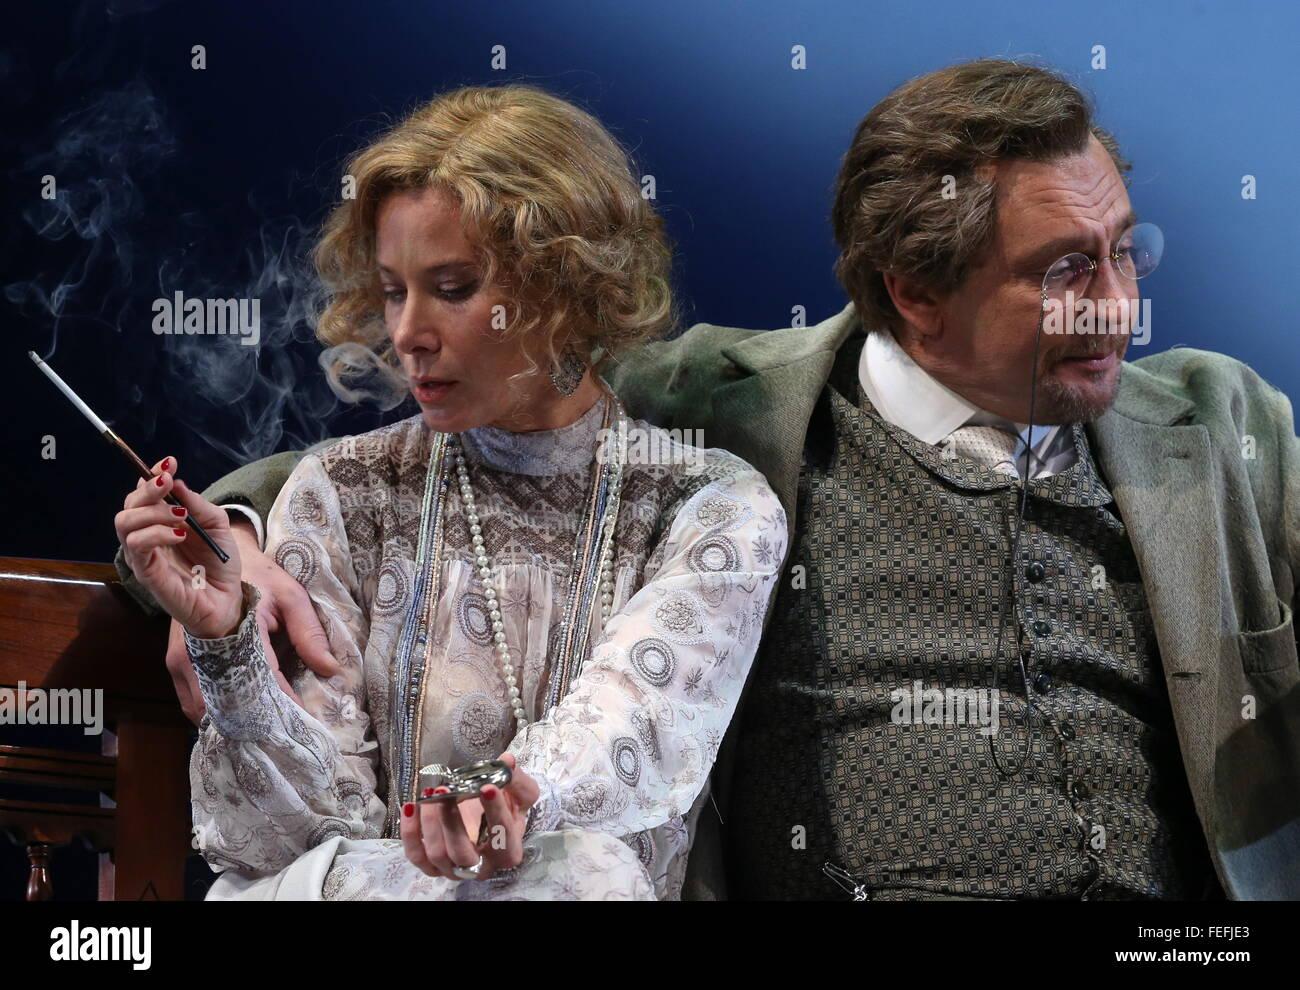 Alexander Domogarov in the company of ladies had fun at a secular party 12/10/2015